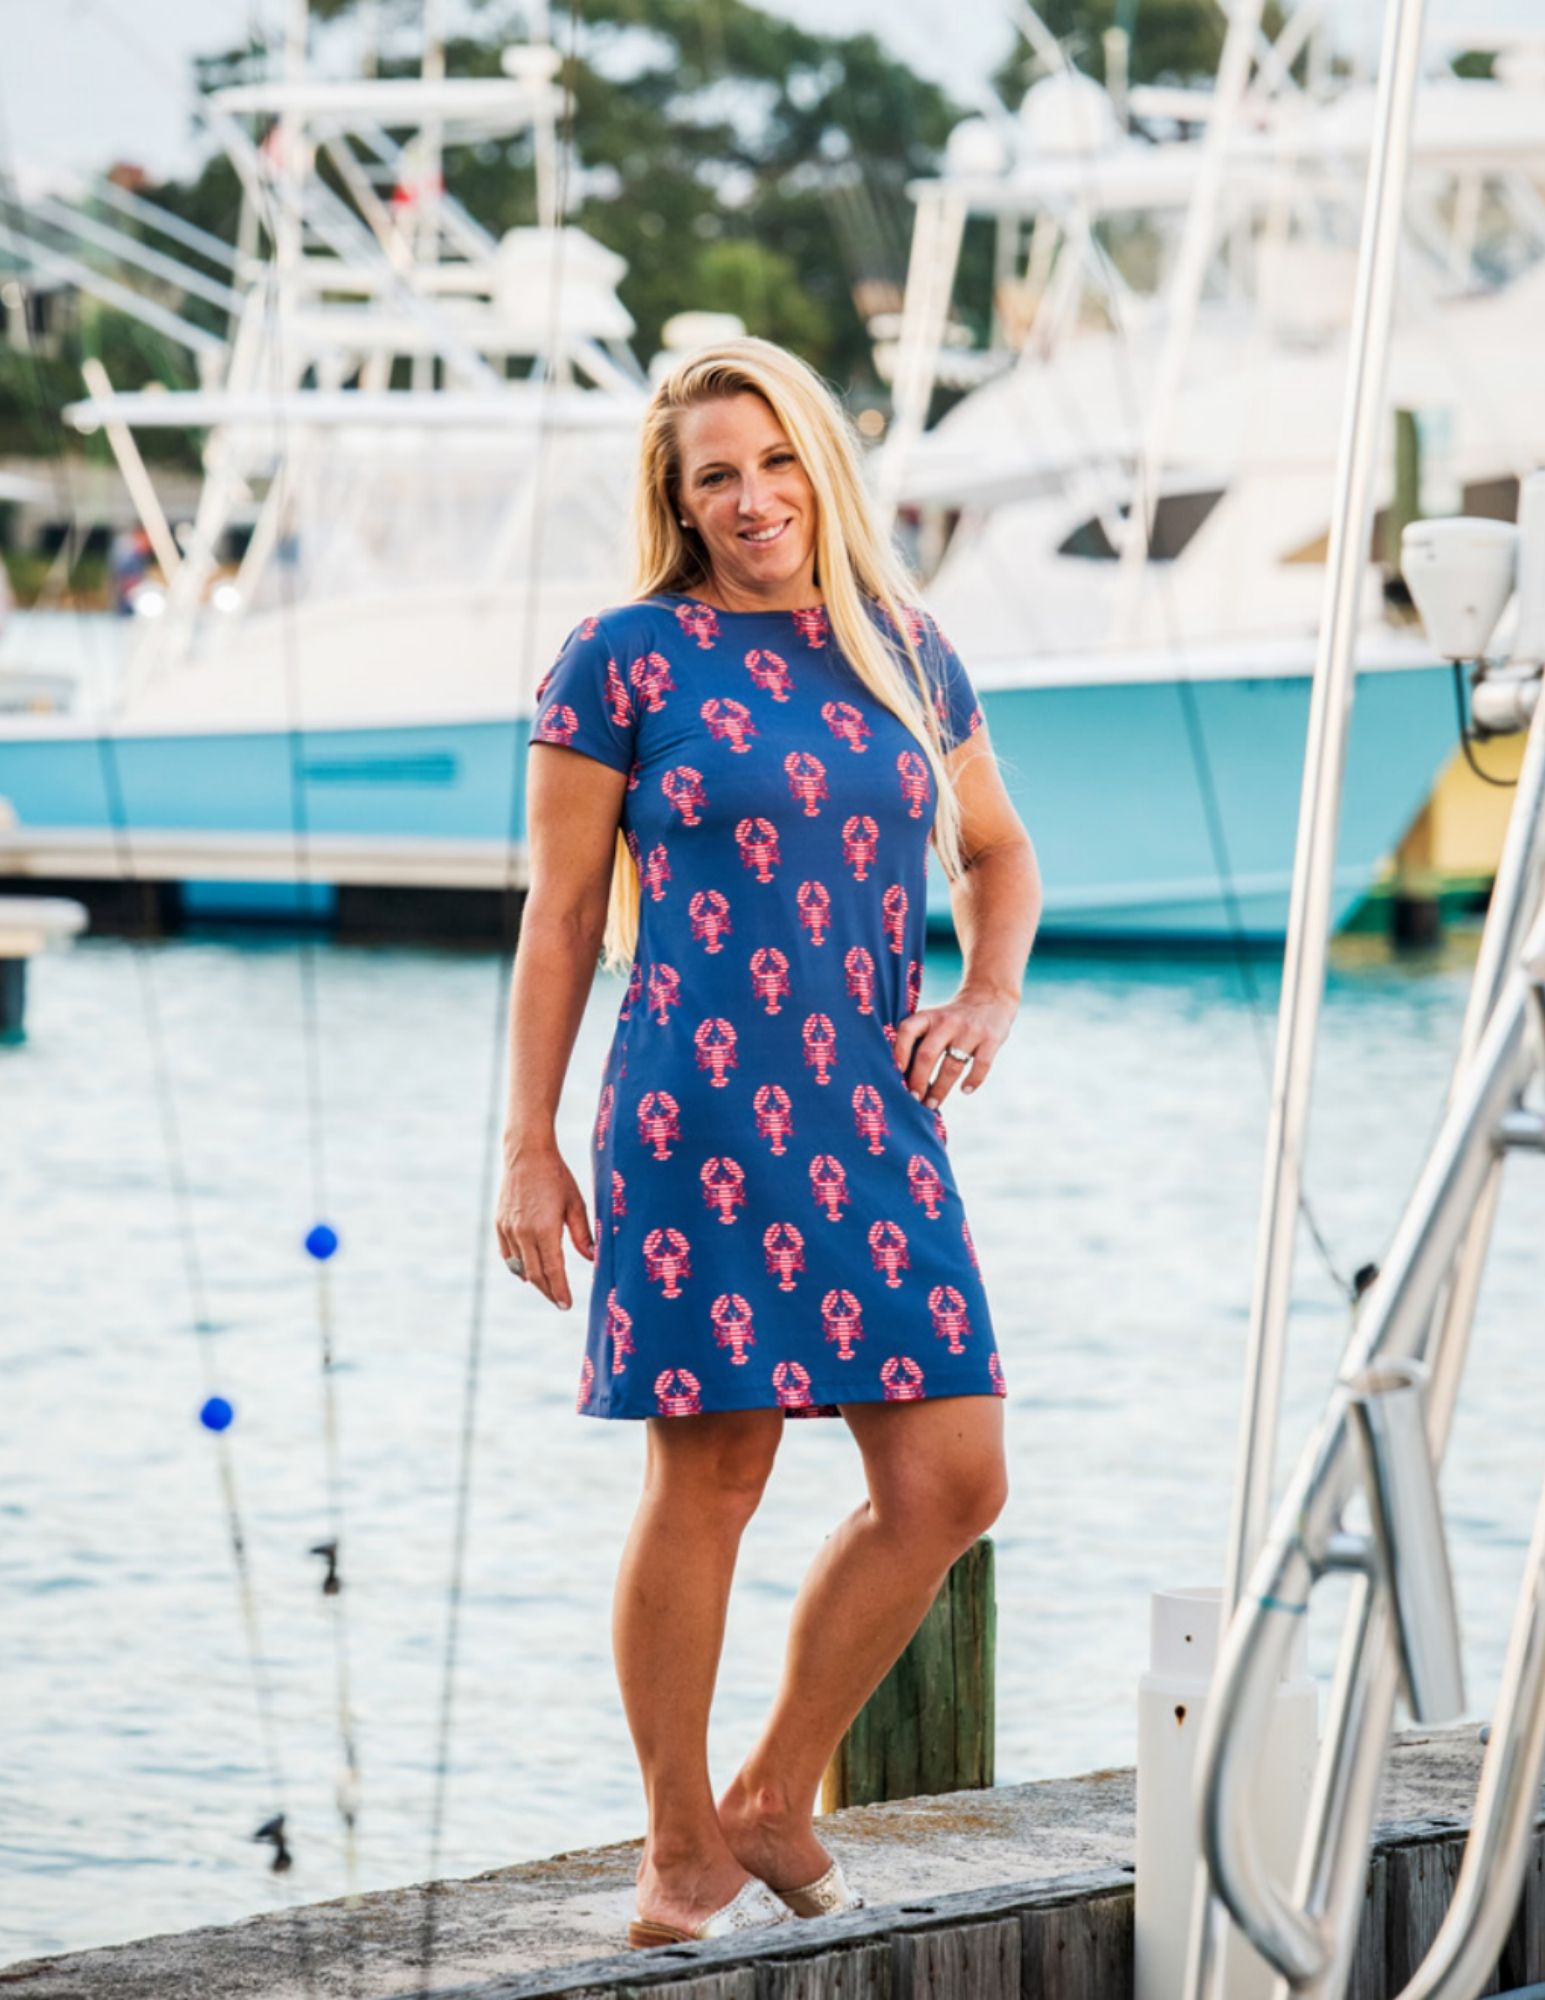 Summer Lovin' in the Marina Lobsters Dress from Sailor-Sailor